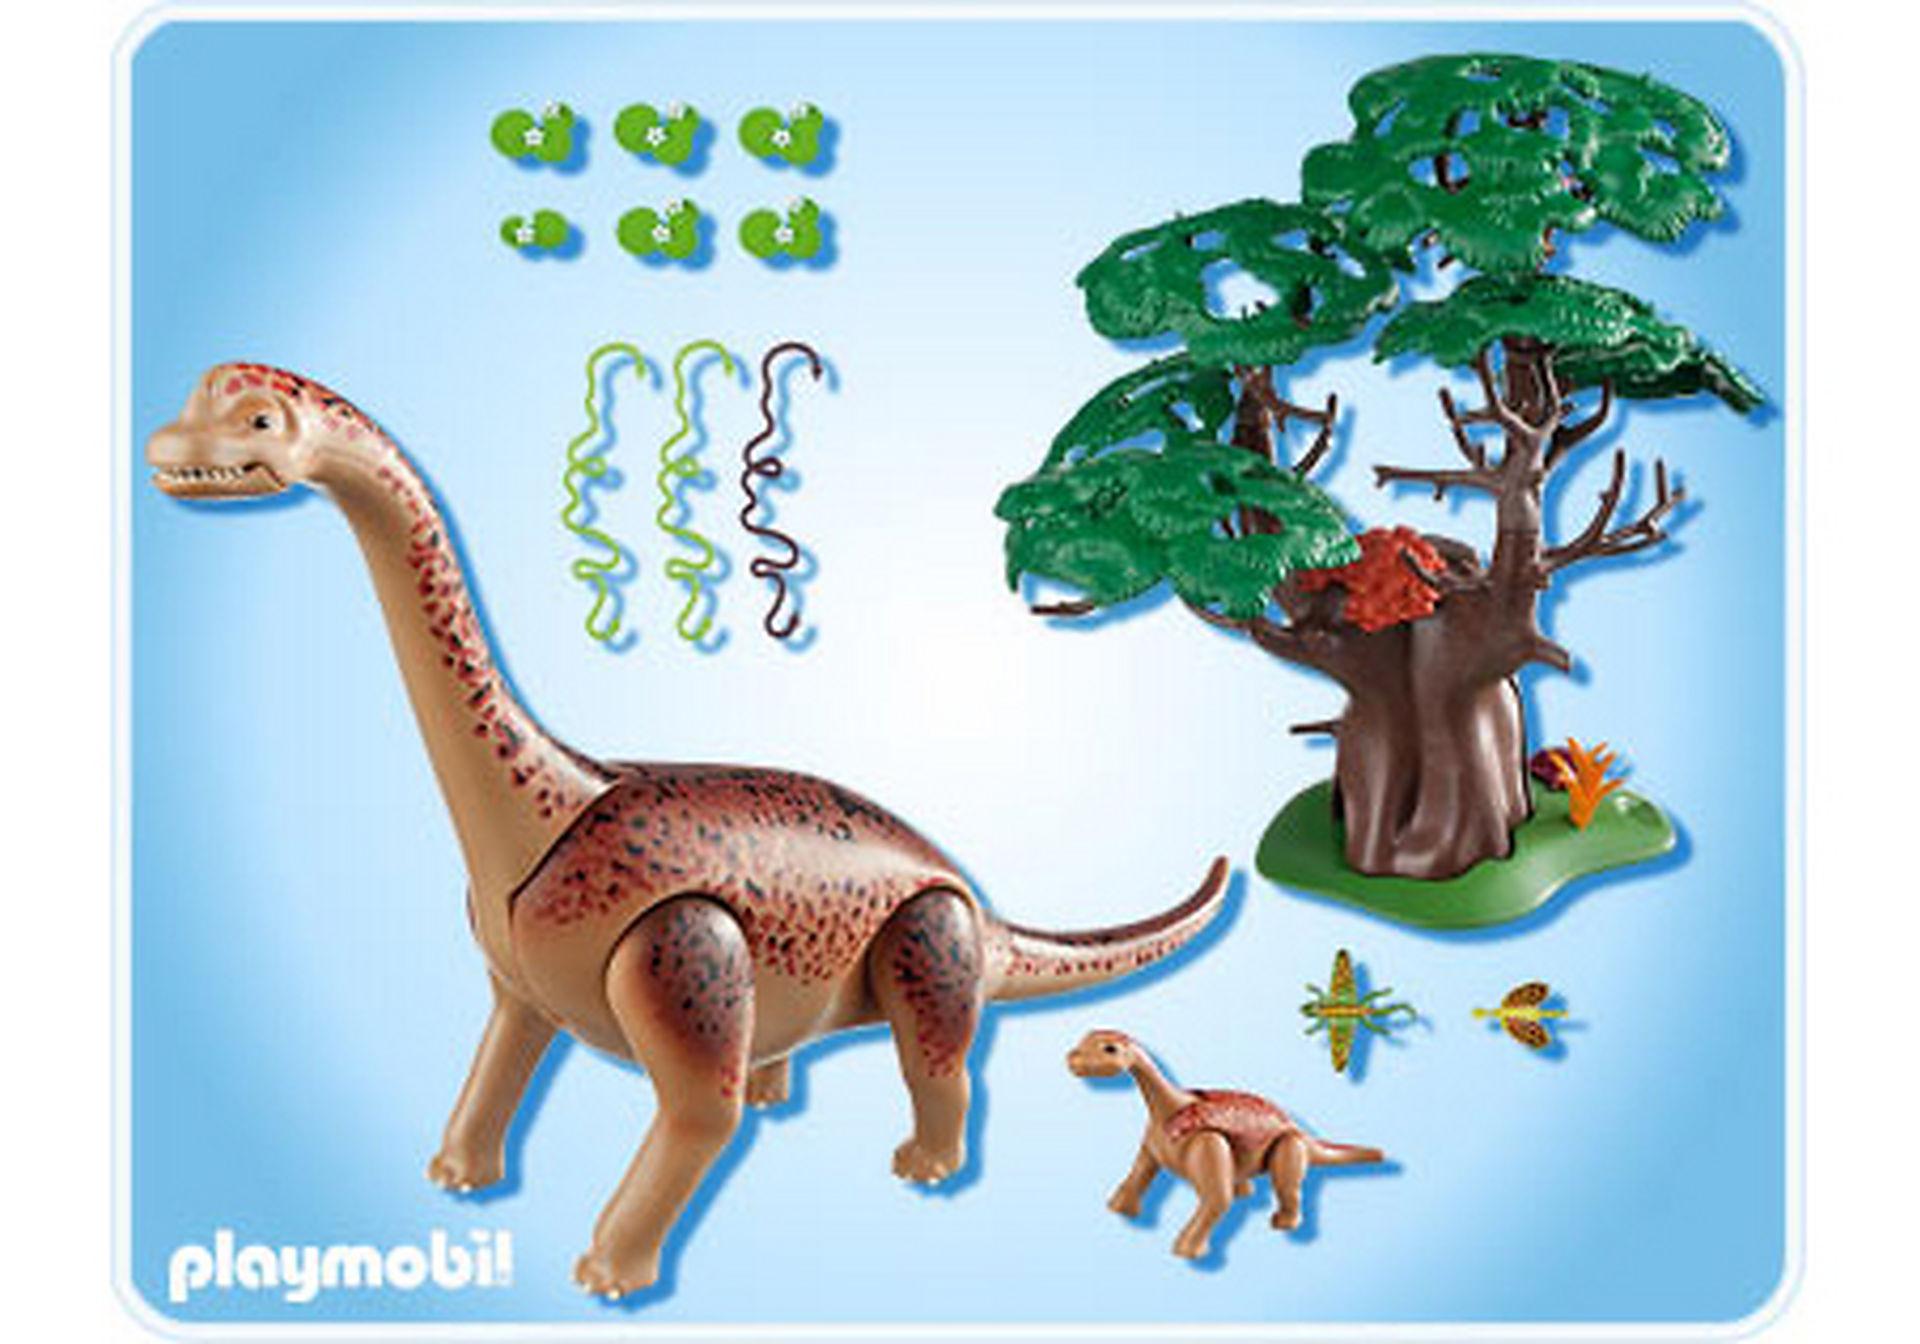 5231-A Brachiosaurus mit Baby zoom image2